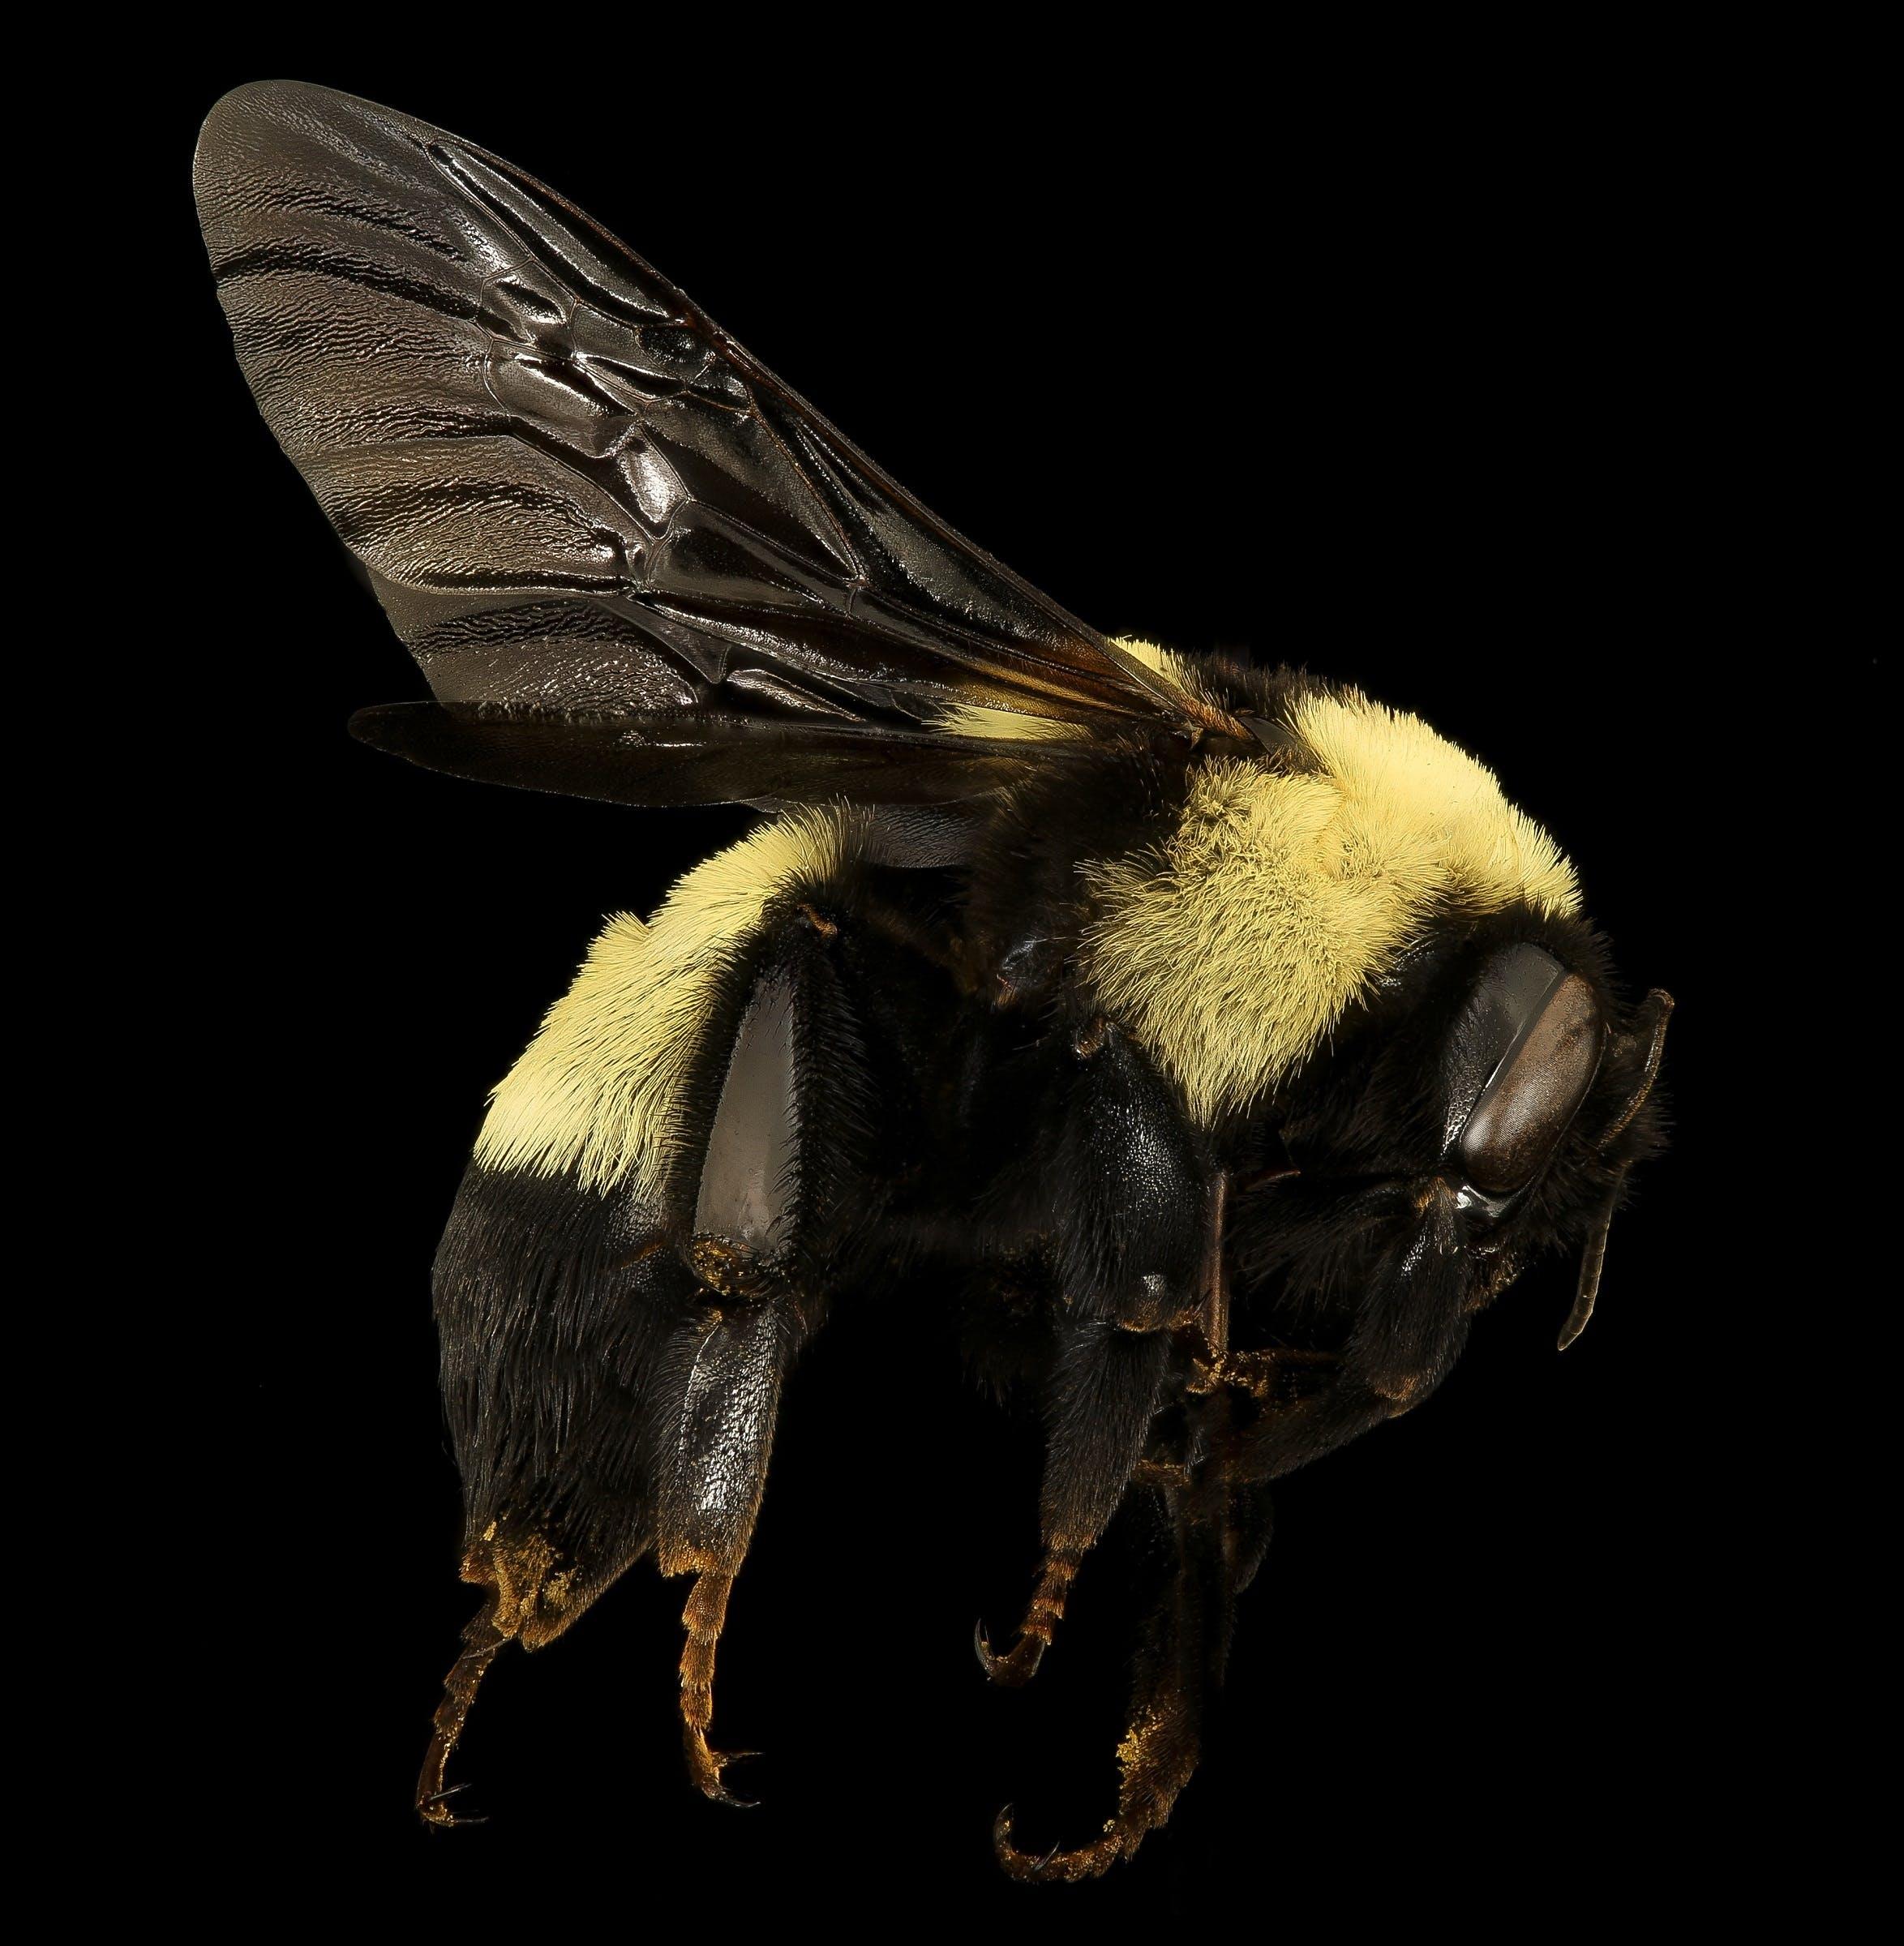 Kostnadsfri bild av bi, humla, insekt, natur